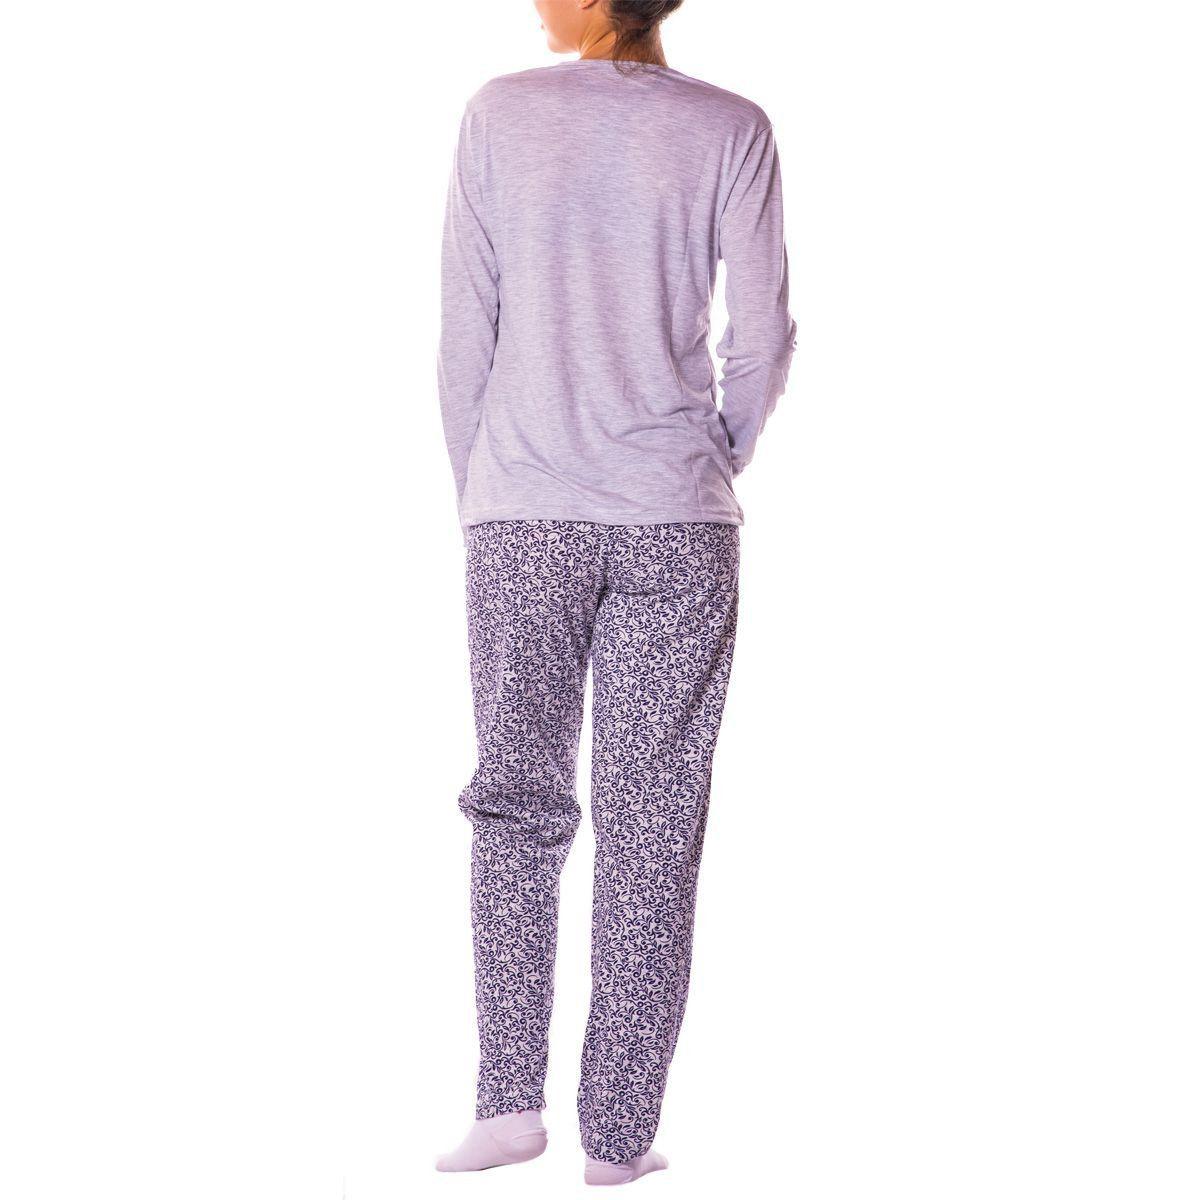 Pijama Feminino de Inverno Estampado Malha Fria - Victory 19111